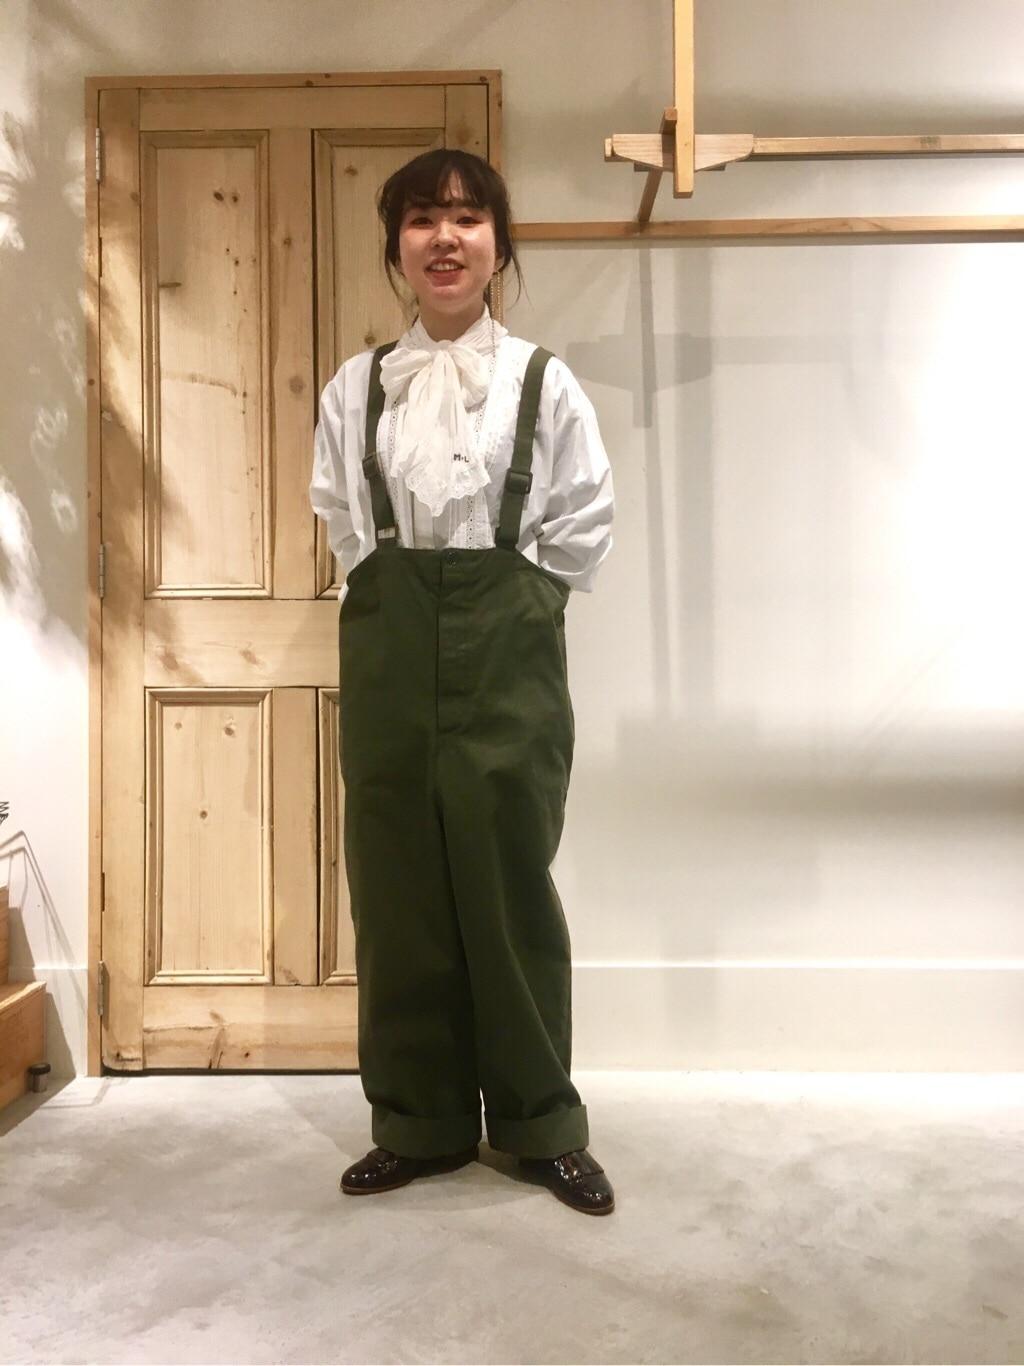 Malle chambre de charme 調布パルコ 身長:152cm 2019.10.30